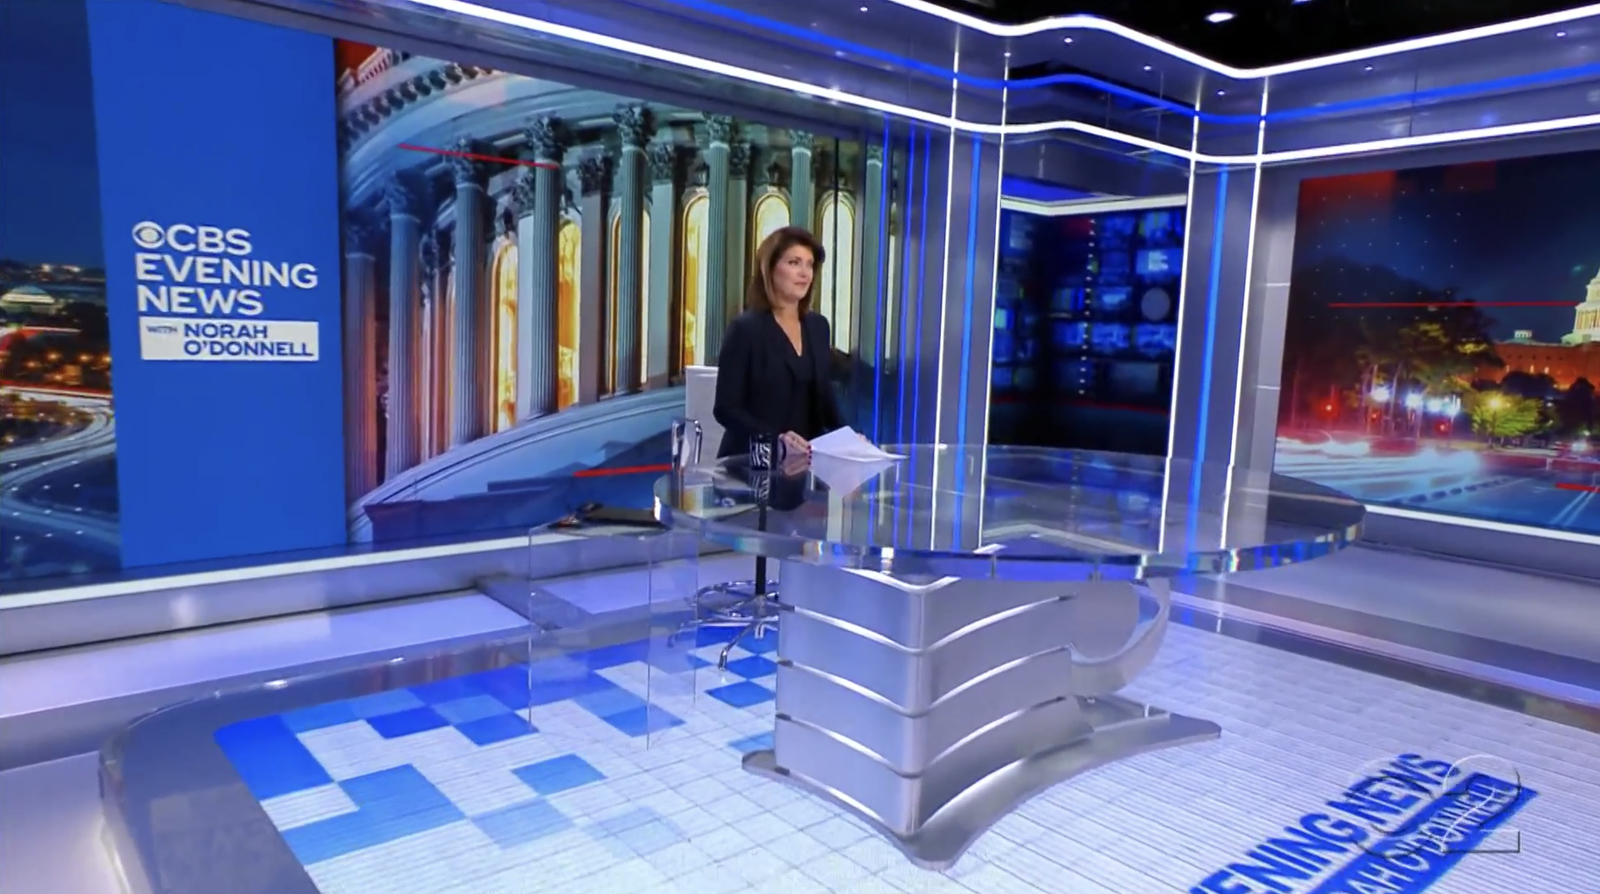 NCS_CBS-News-Washington-Bureau_STUDIO-2019_0005